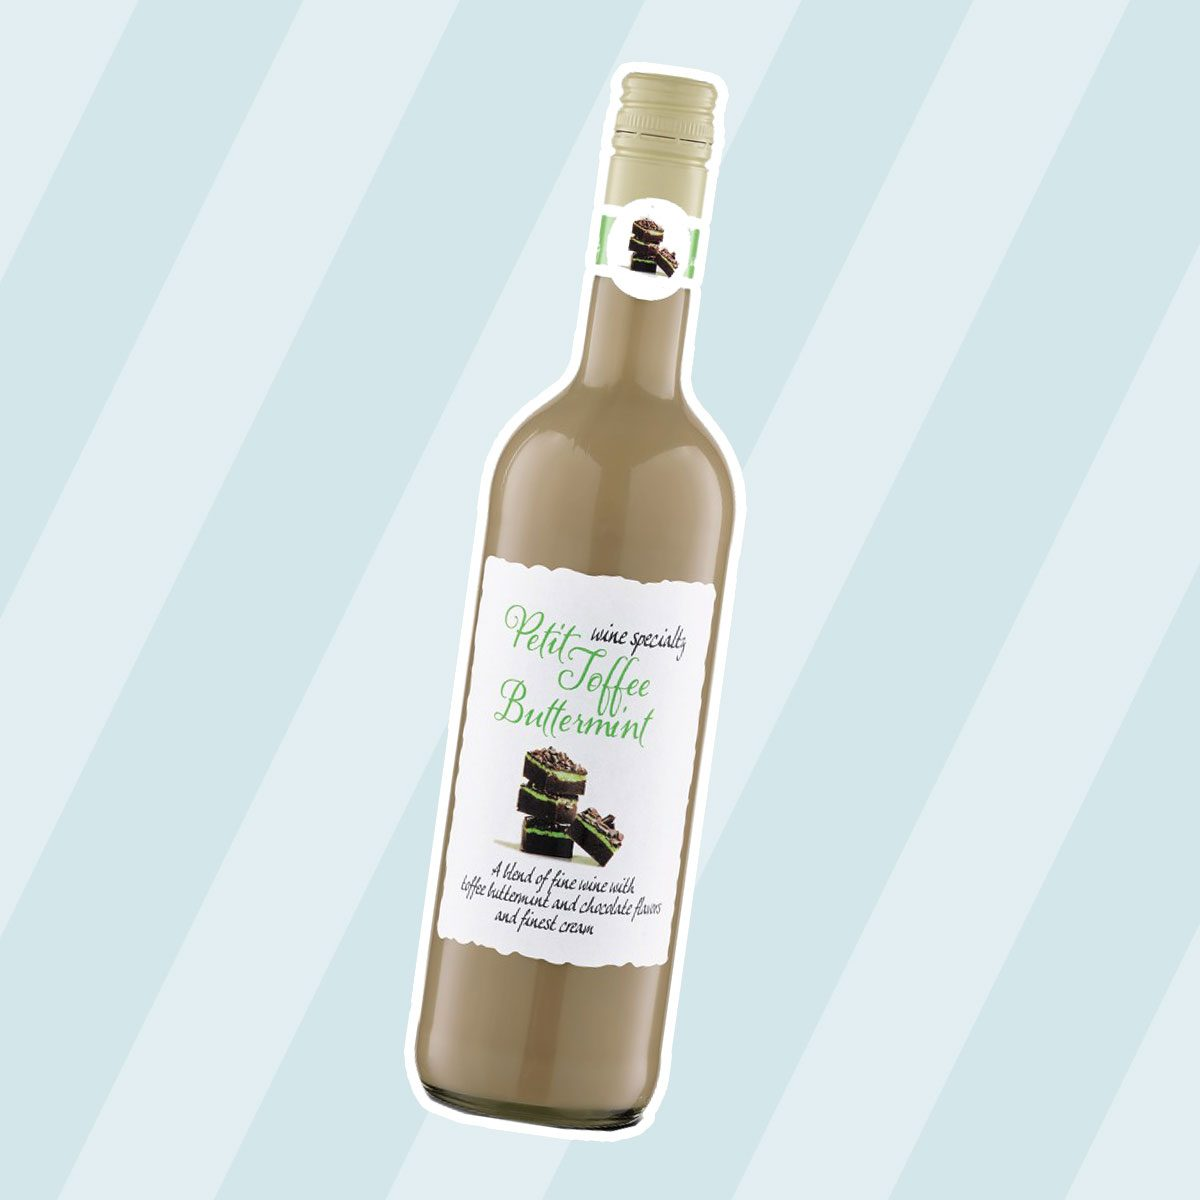 Petit Toffee Buttermint Wine